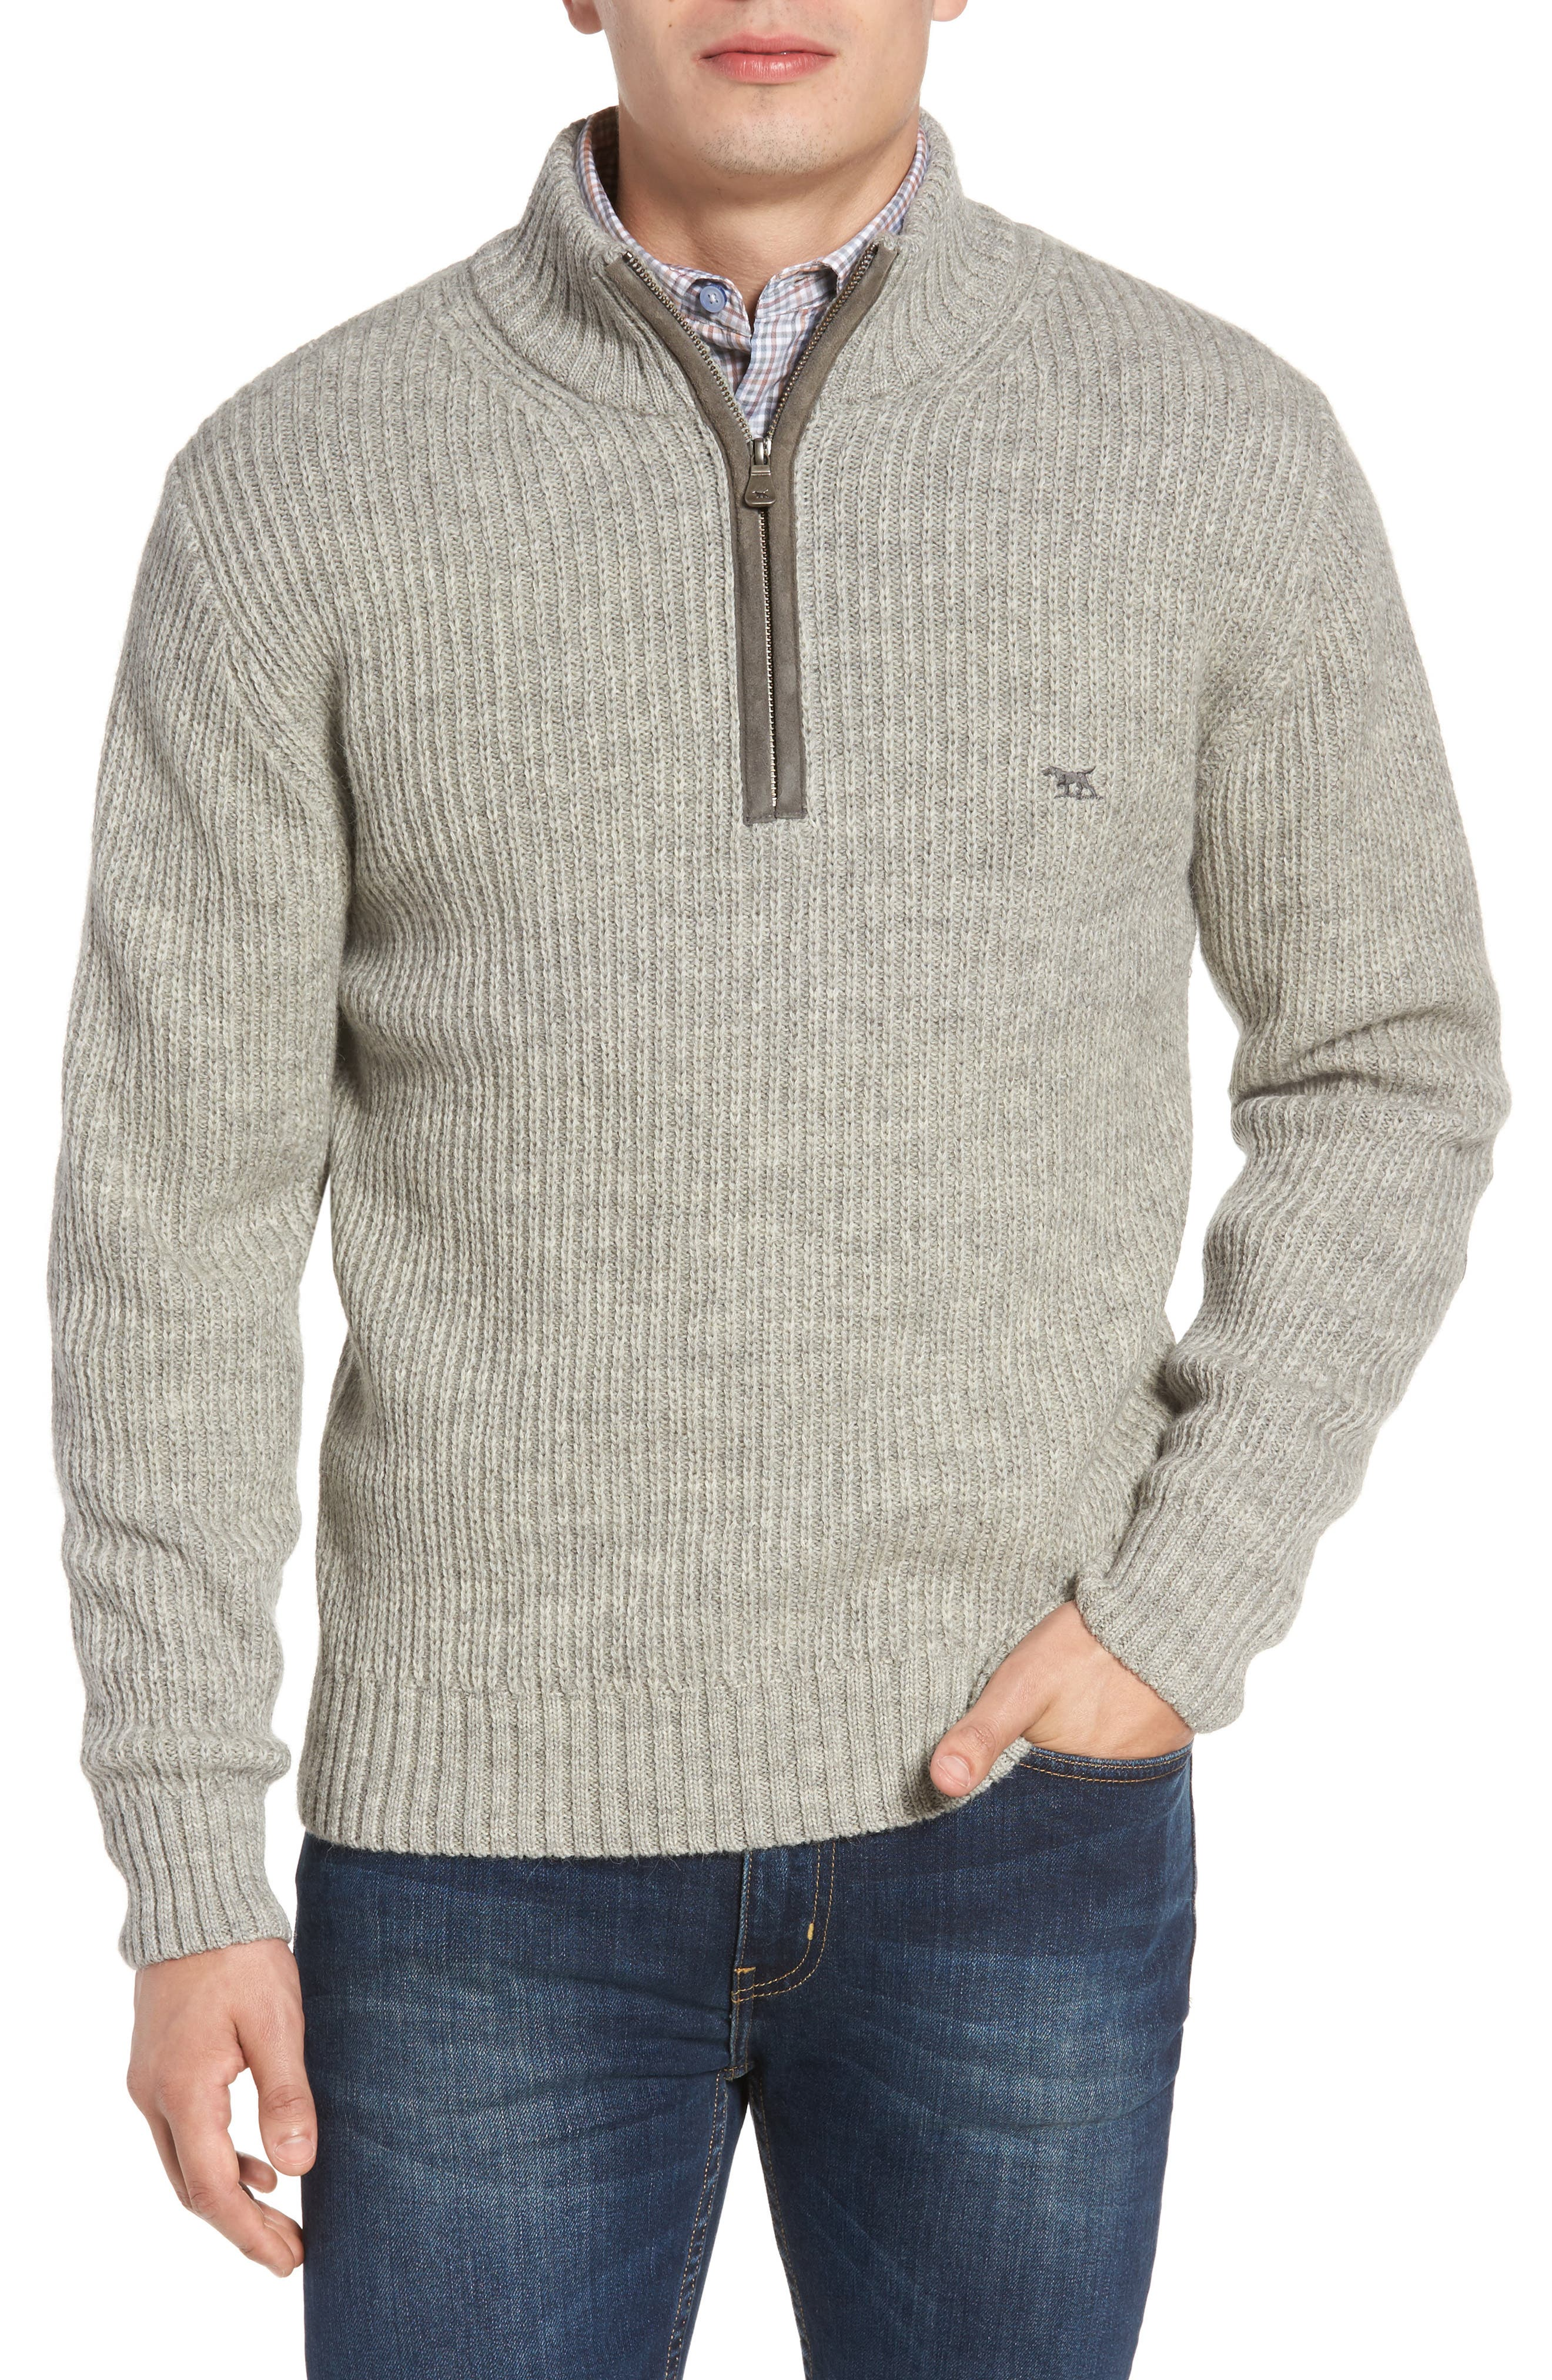 'Huka Lodge' Merino Wool Blend Quarter Zip Sweater,                             Main thumbnail 1, color,                             268